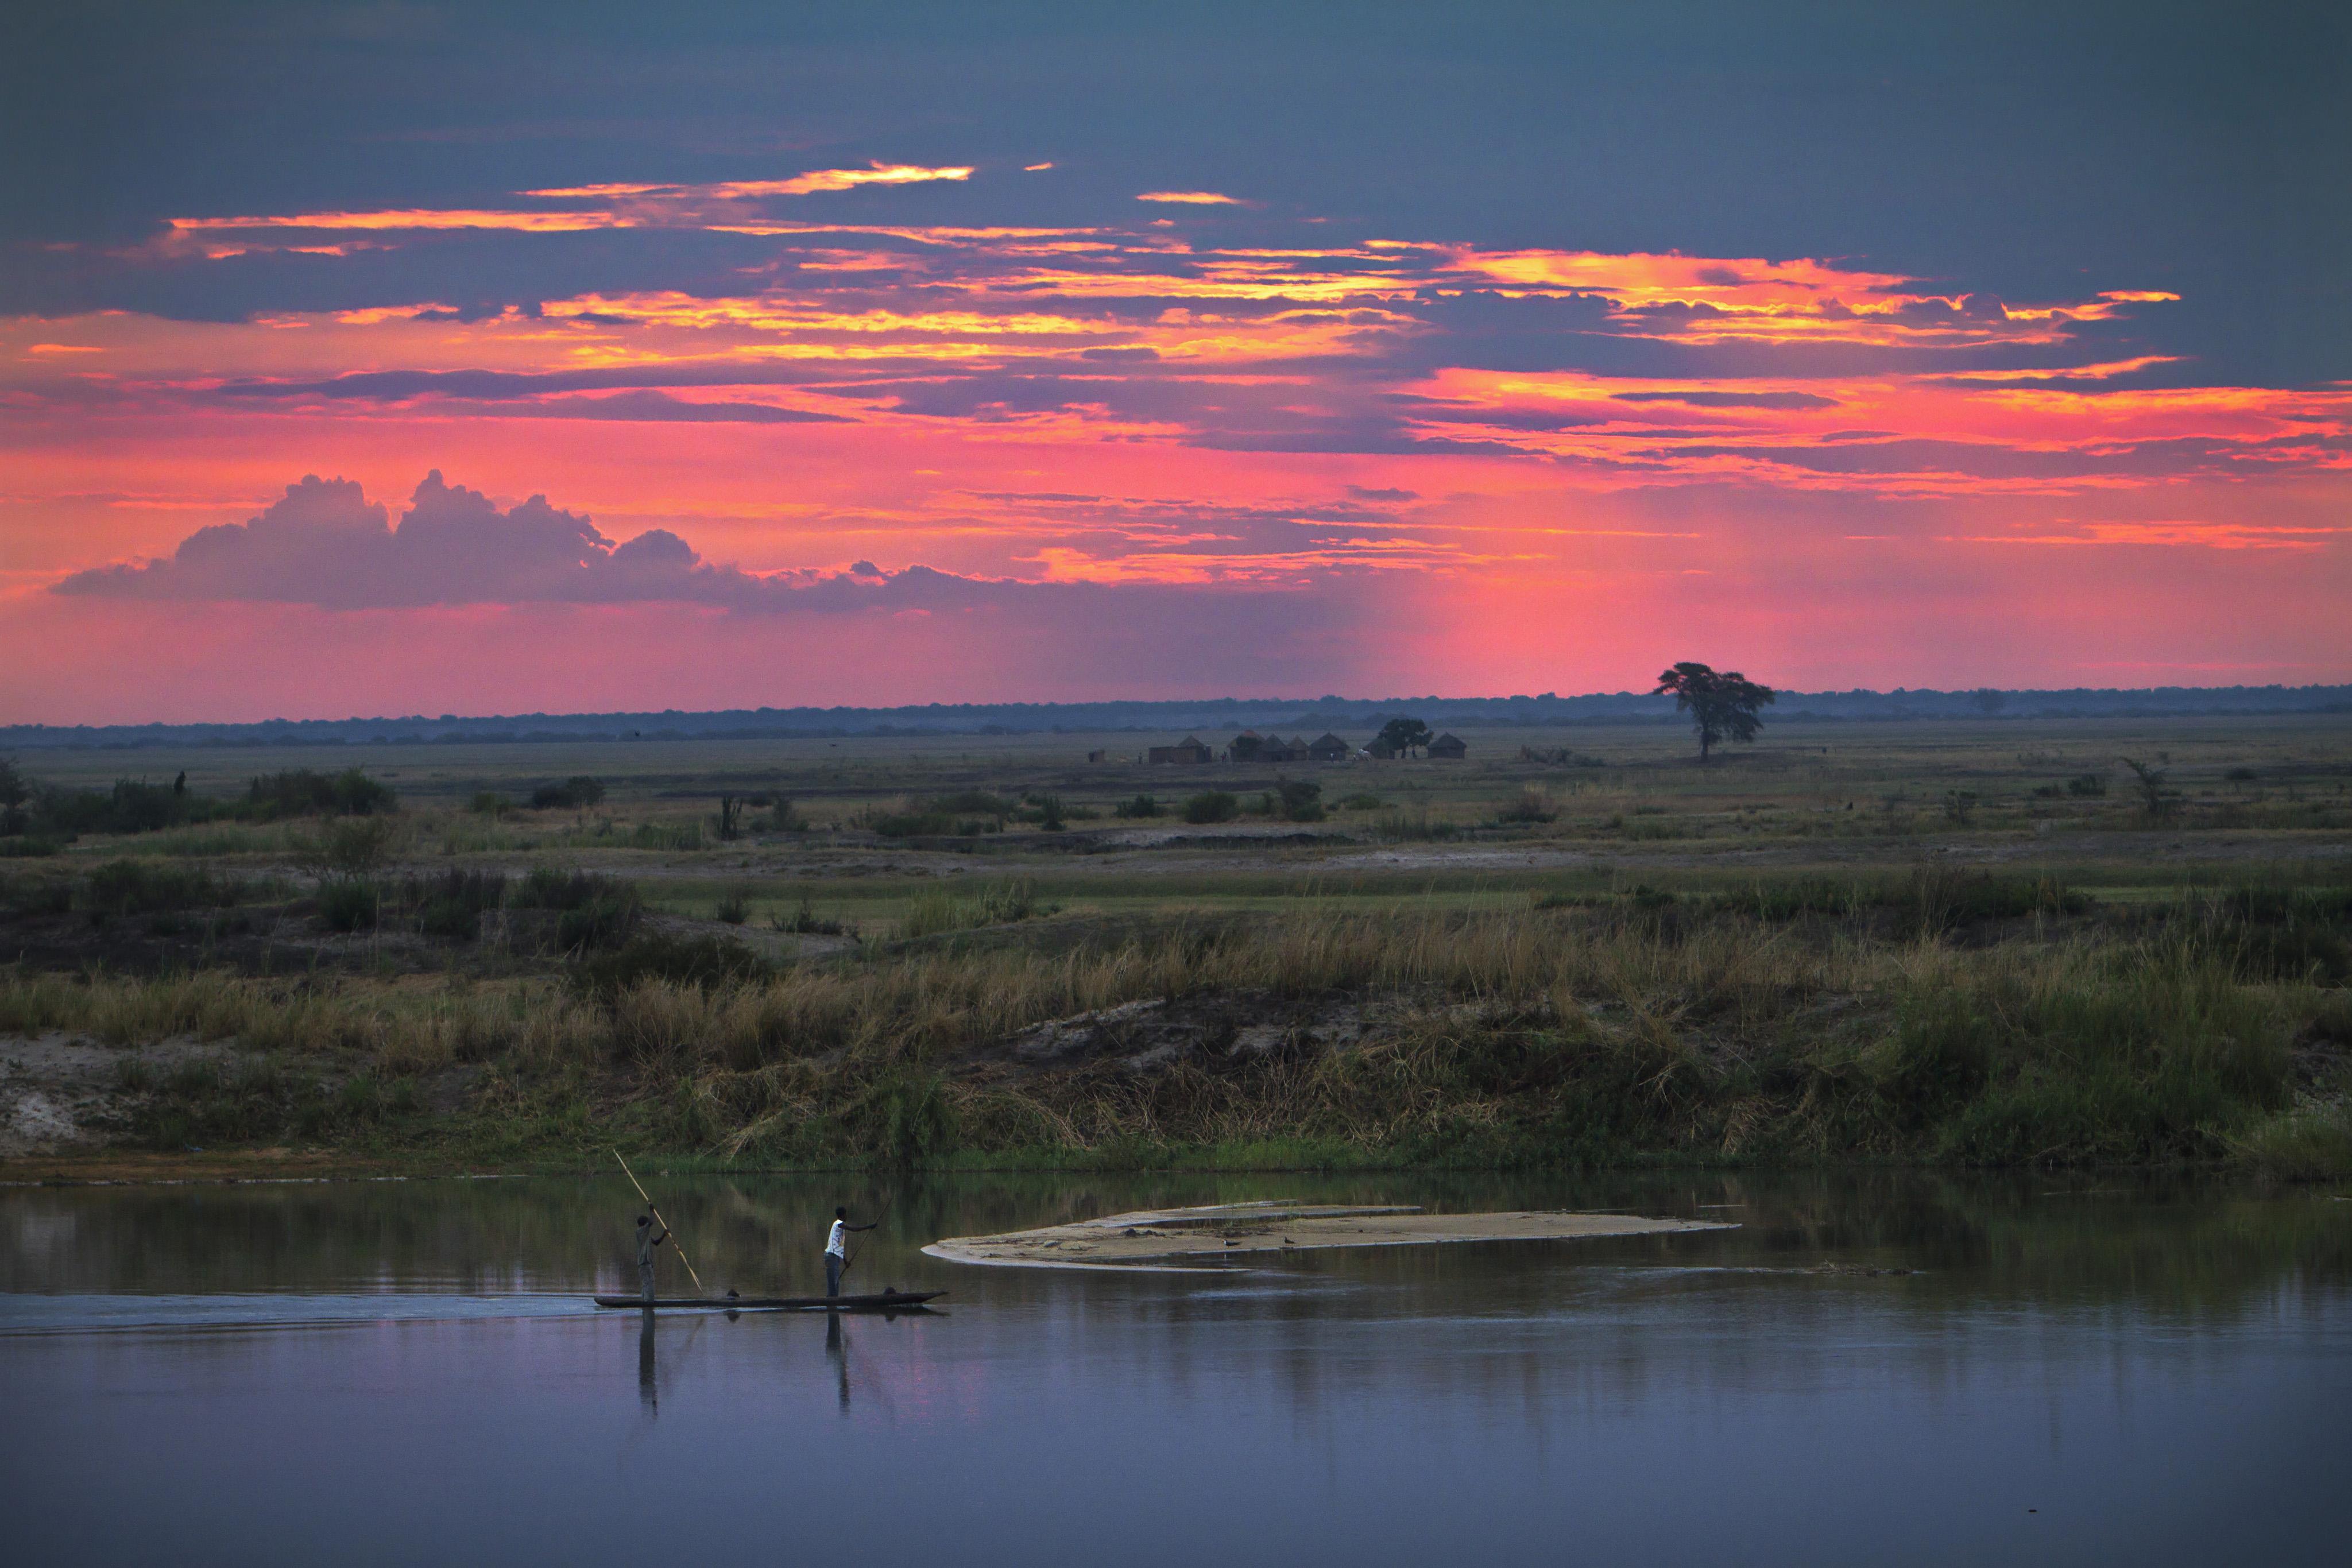 Night shift fishermen, Mongu, Western Zambia. Photo by Felix Clay/Duckrabbit, 2012.